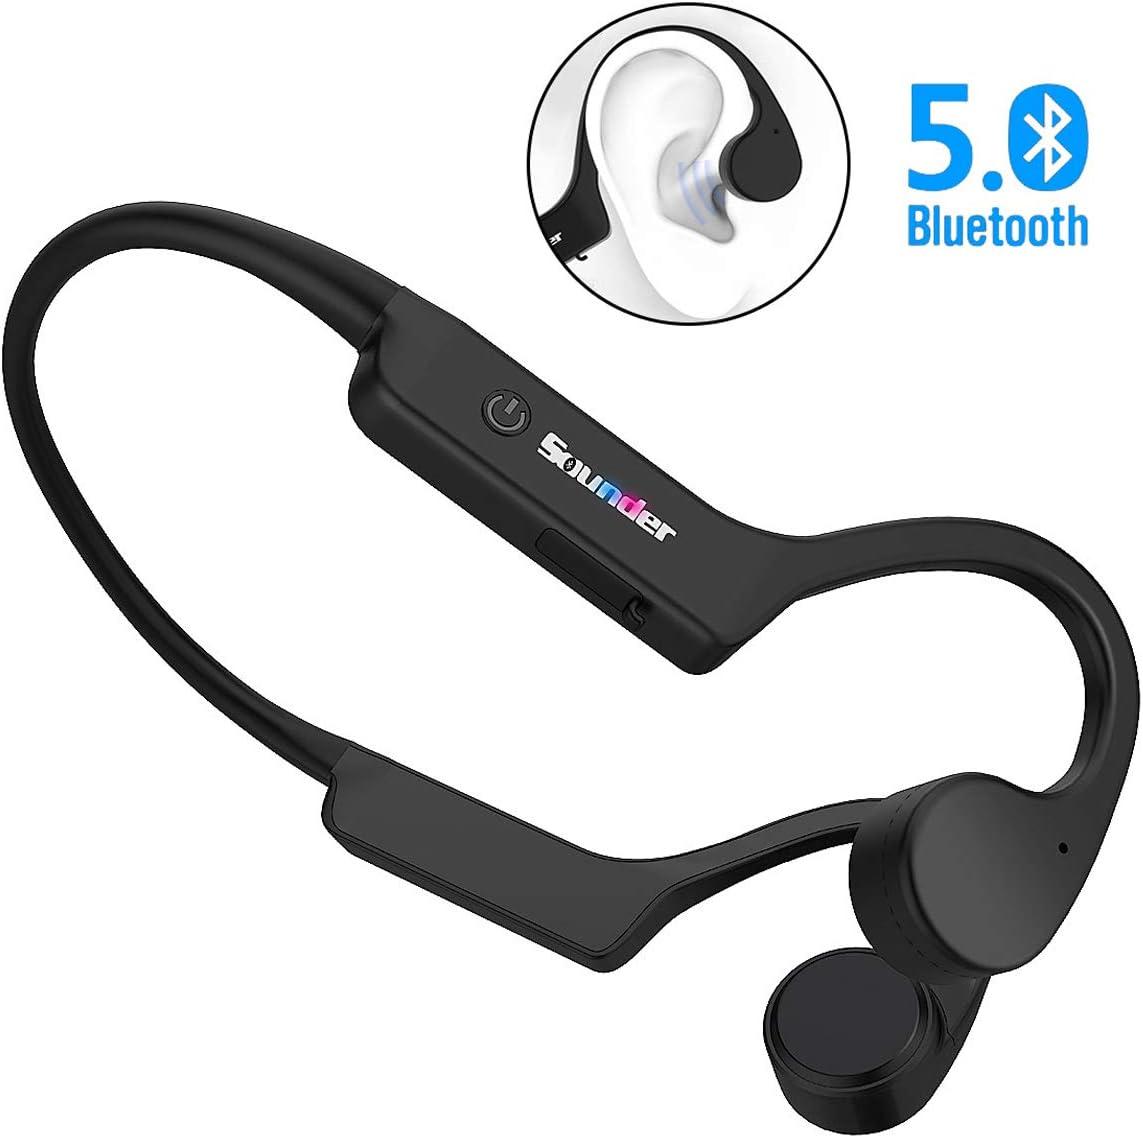 Open Ear Wireless Bluetooth Bone Conduction Headphones, Senli Free Ears Lightweight Sports Headsets IPX56 Waterproof BT 5.0 HD Phone Call Earphone for Jogging Running Driving Cycling Sweatproof Earset